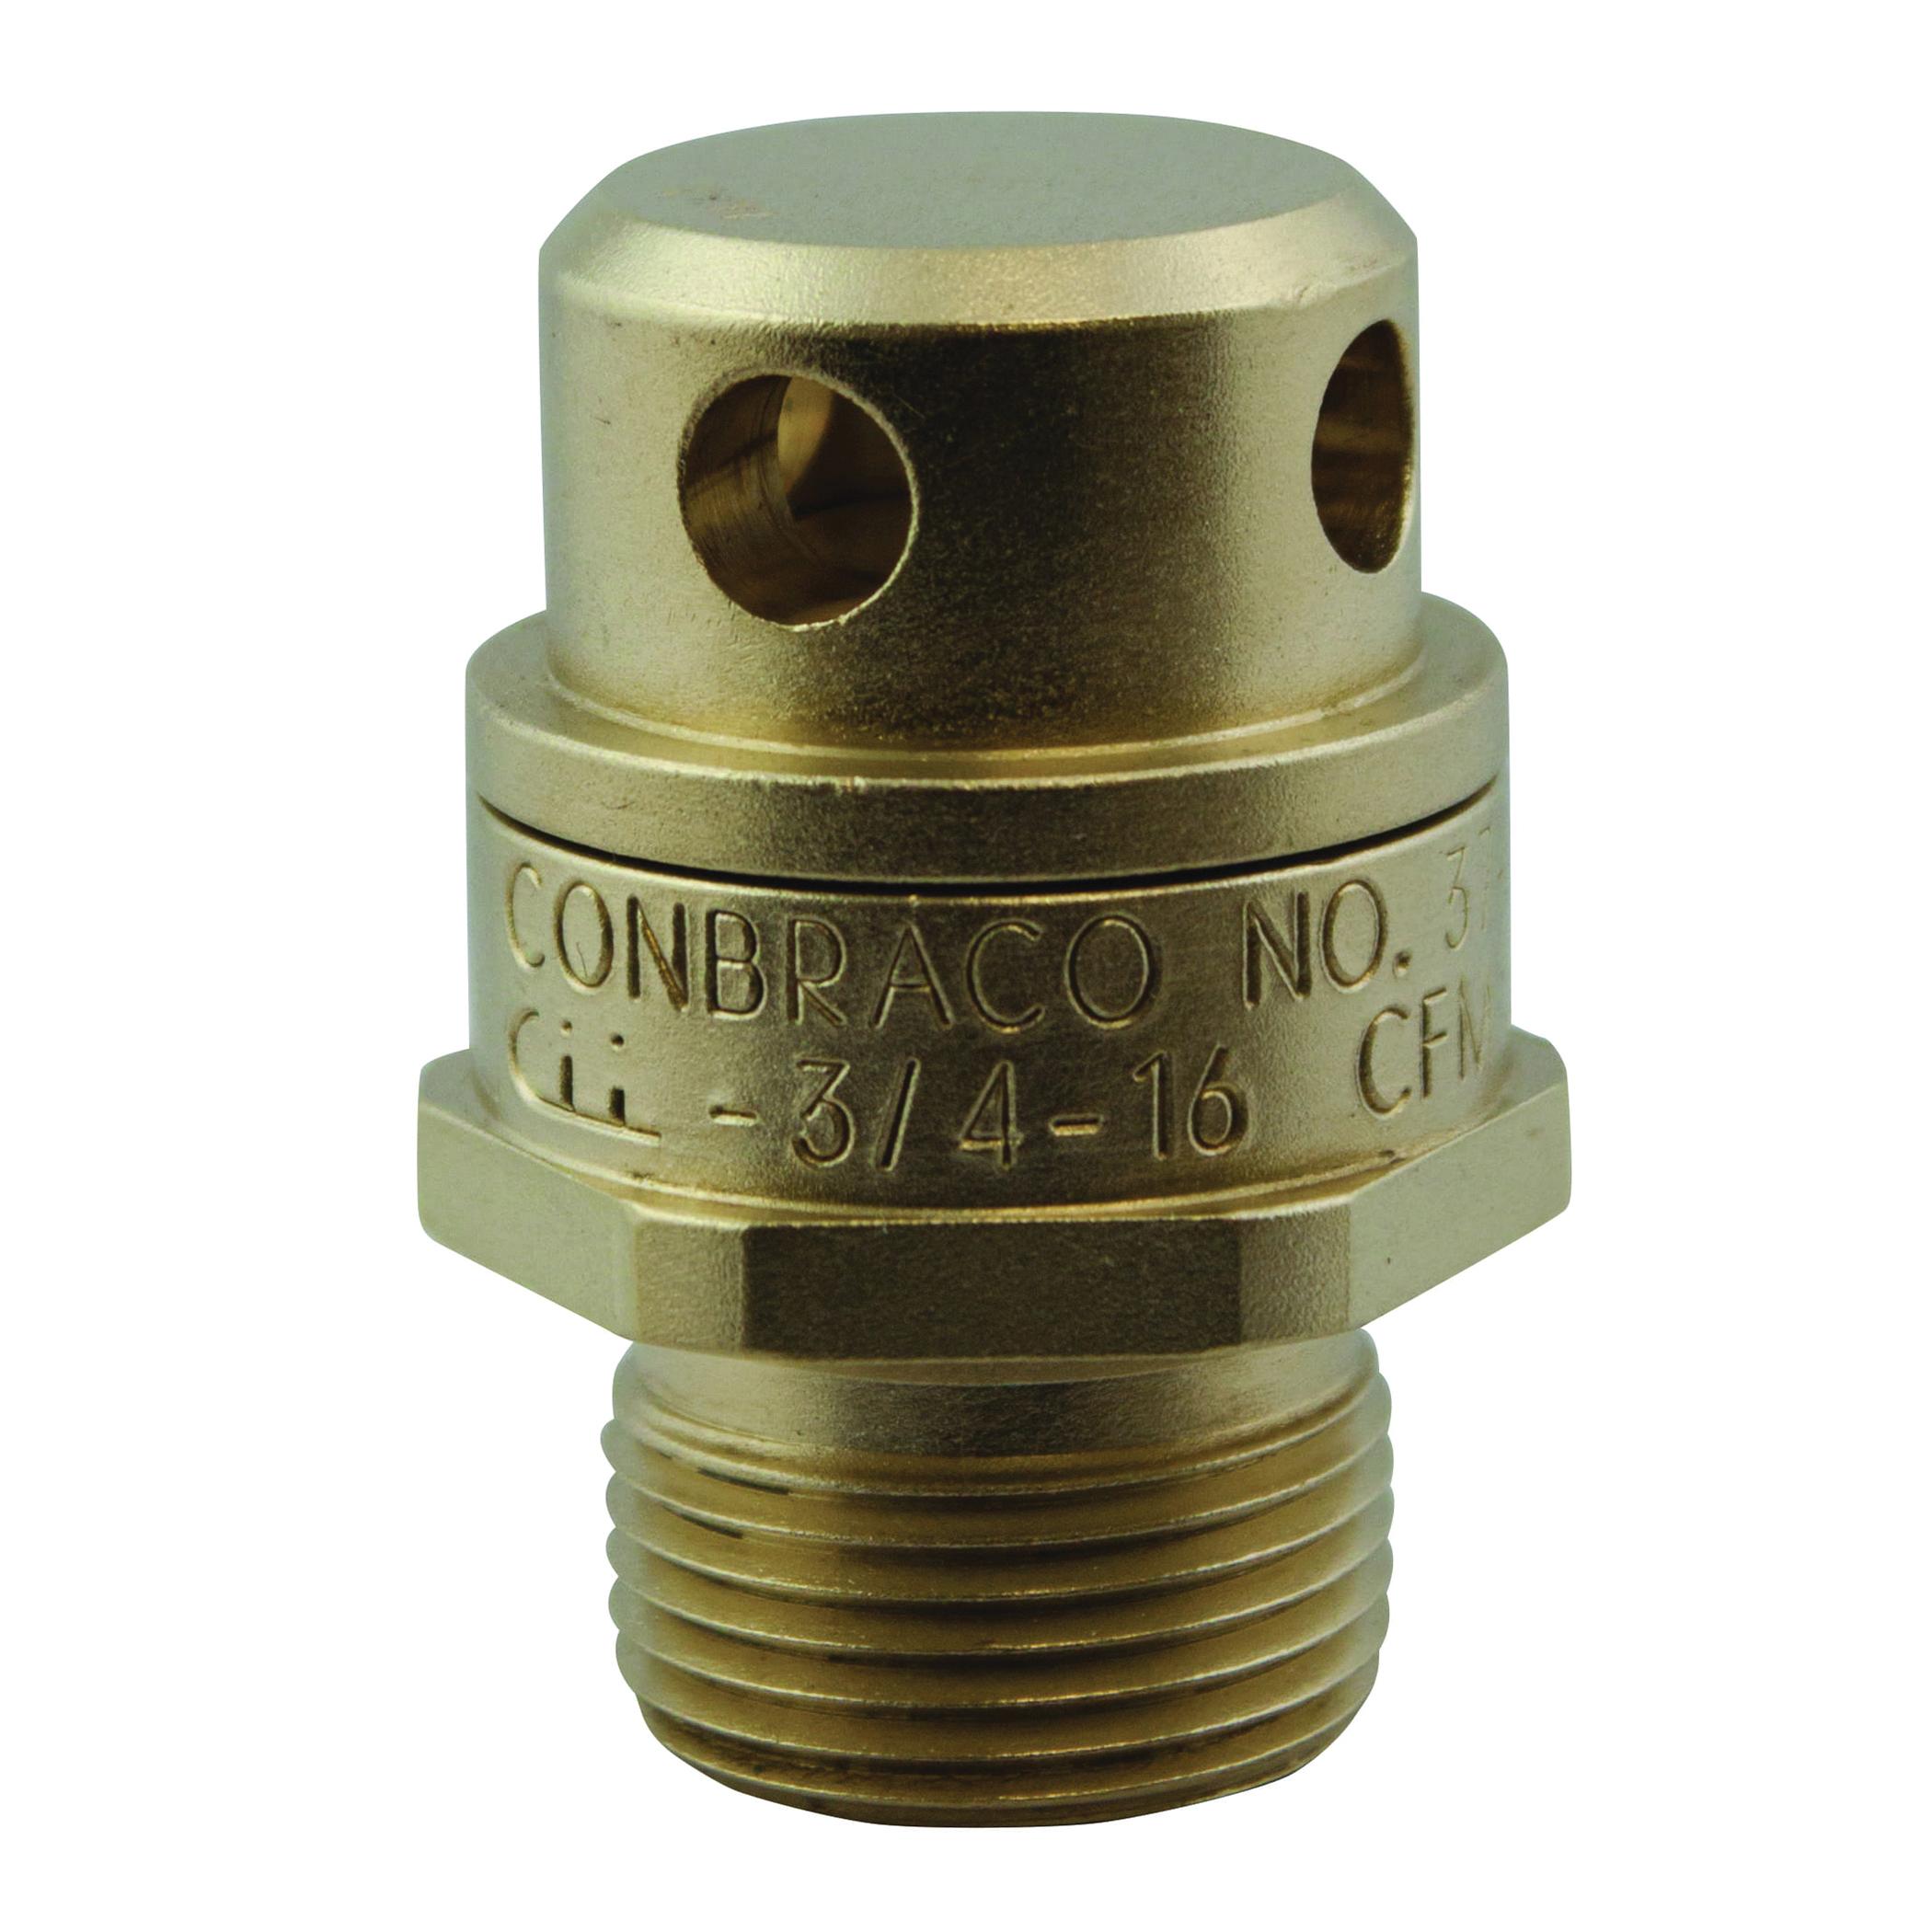 Apollo® 37-202-01 Satin Brass Vacuum Relief Valve, 3/4 in, Threaded, 200 psig, 250 deg F